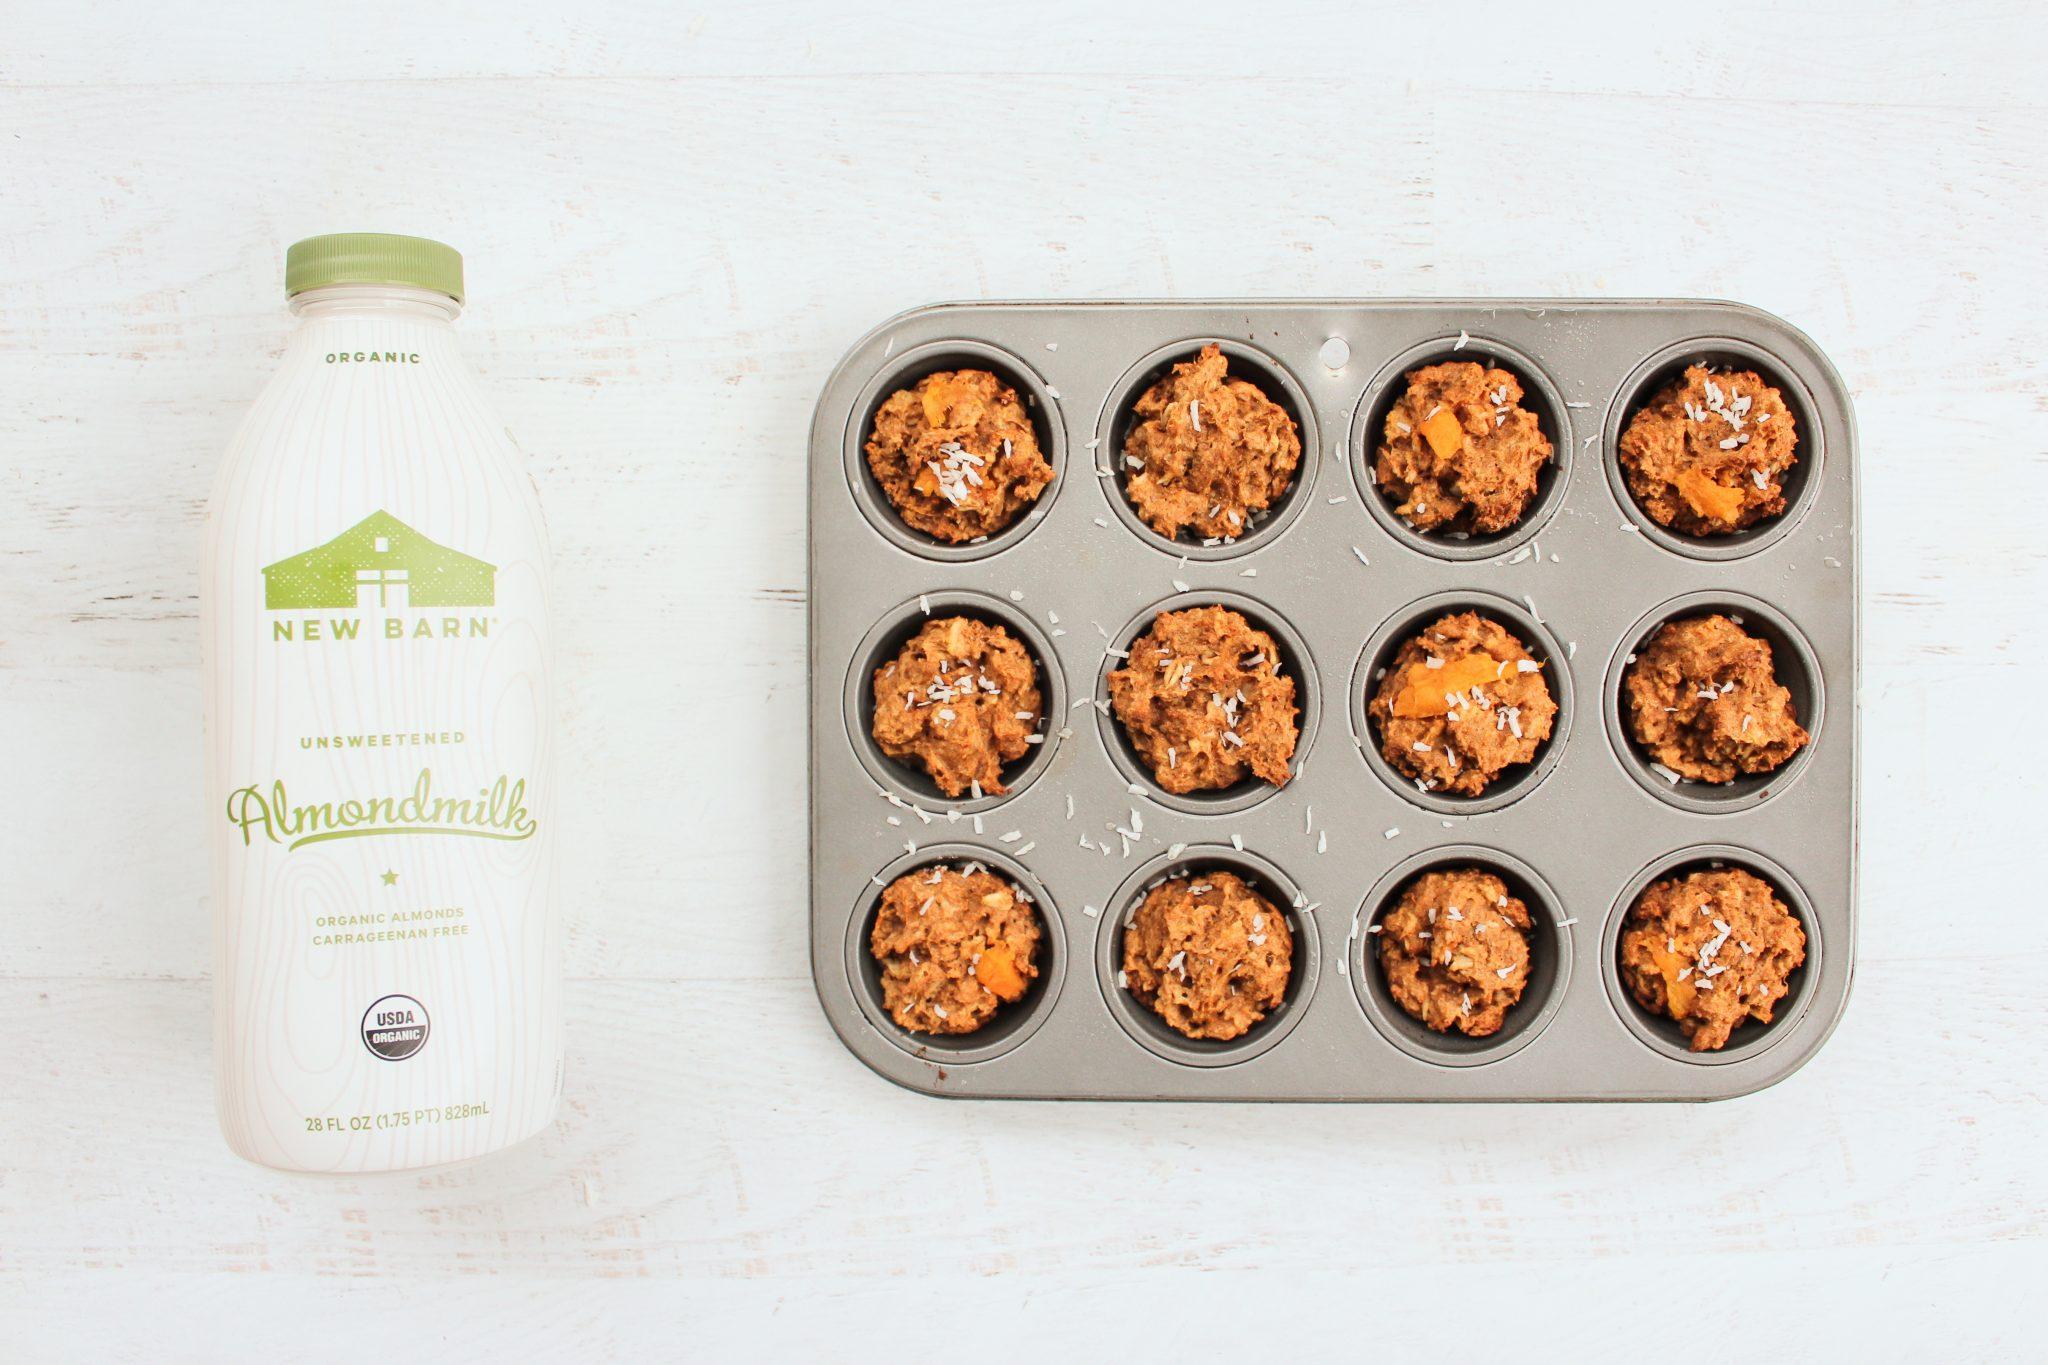 Cinnamon Sweet Potato Muffins | Hashtag Vegan